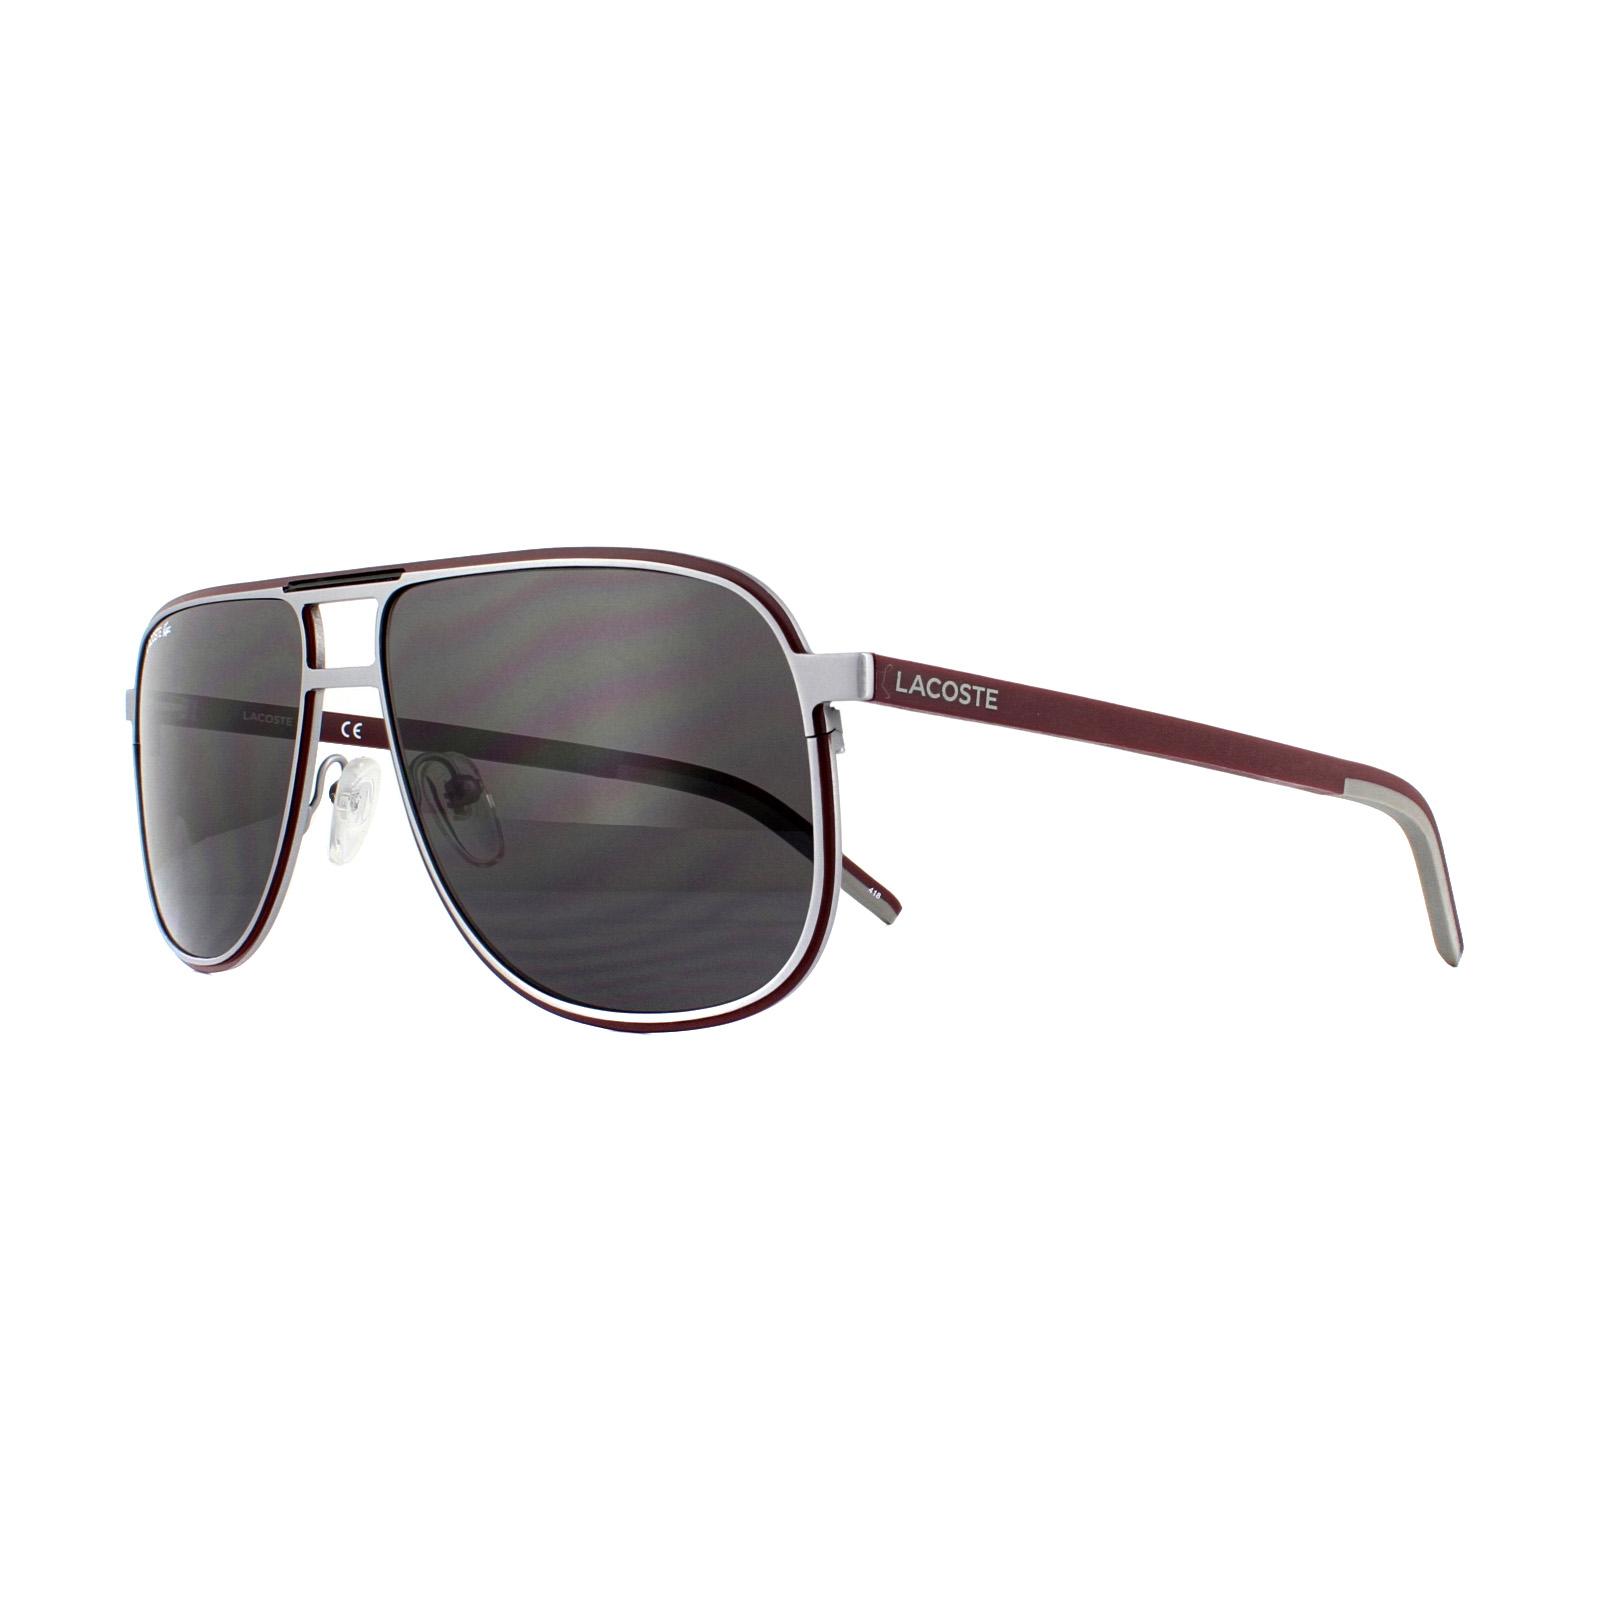 7519087978 Lacoste Sunglasses L192S 038 Matte Light Grey Red Grey 886895336673 ...